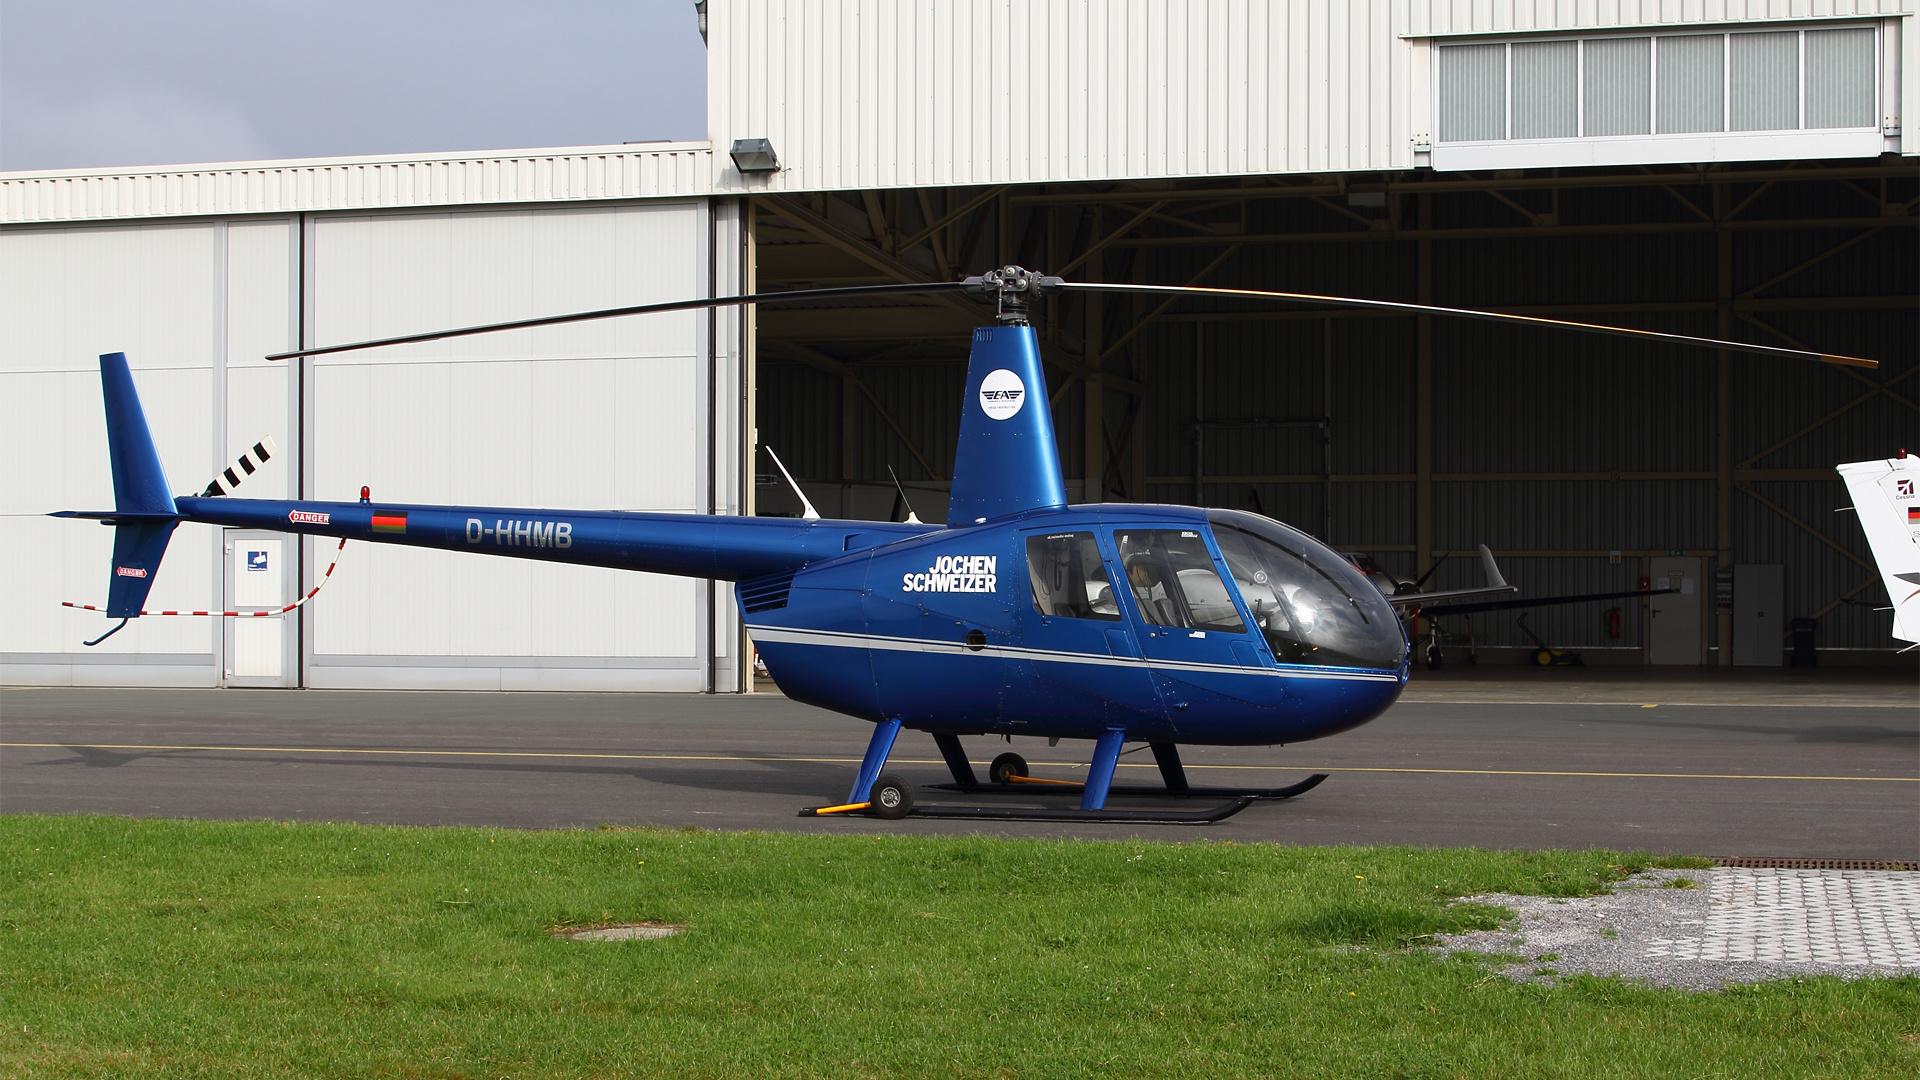 D-HHMB-1 R44 ESS 201409